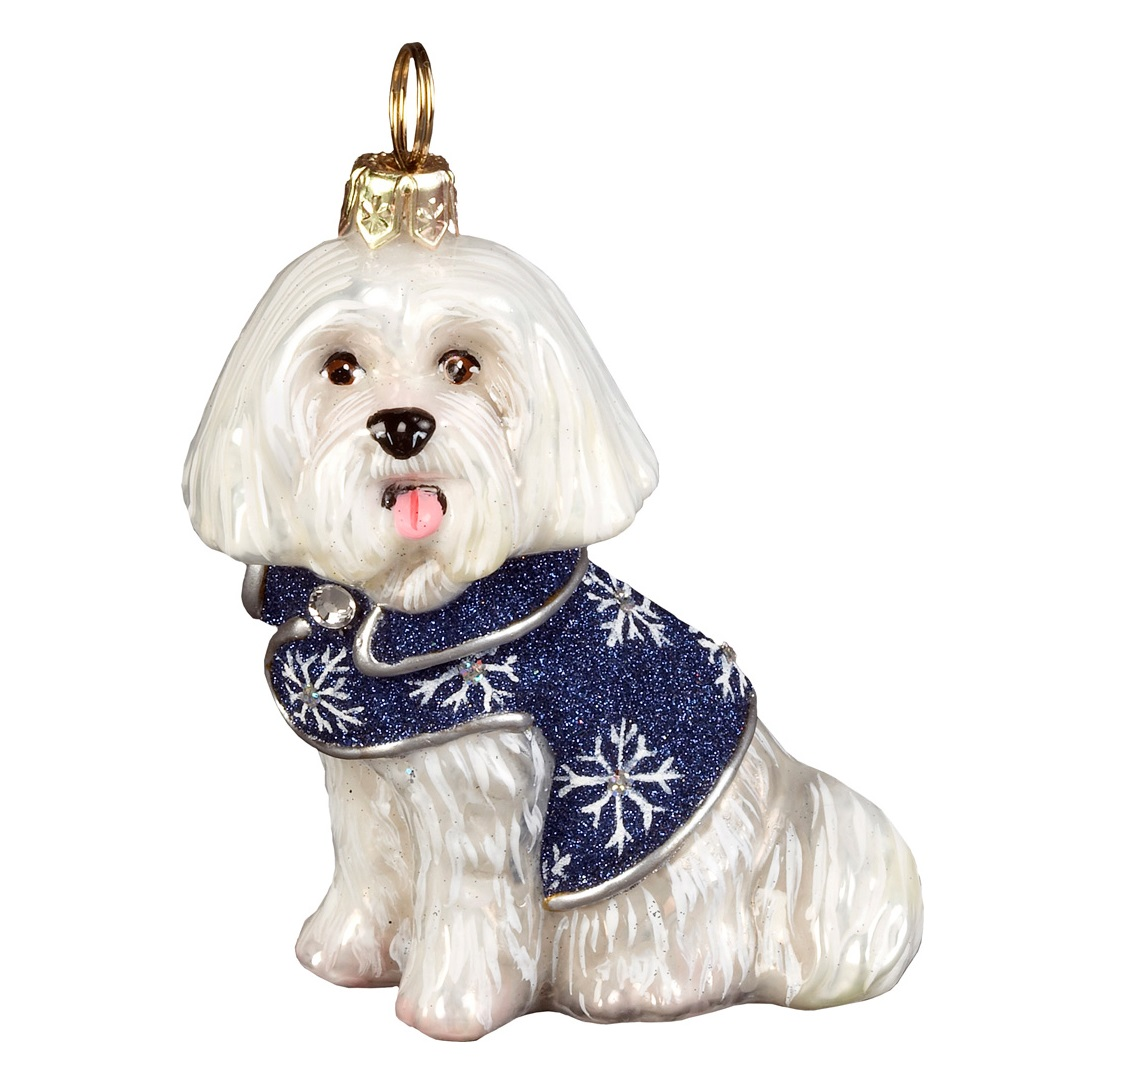 xmas_kerstbal_ornament_hond_maltezer_sneeuwvlok_jas